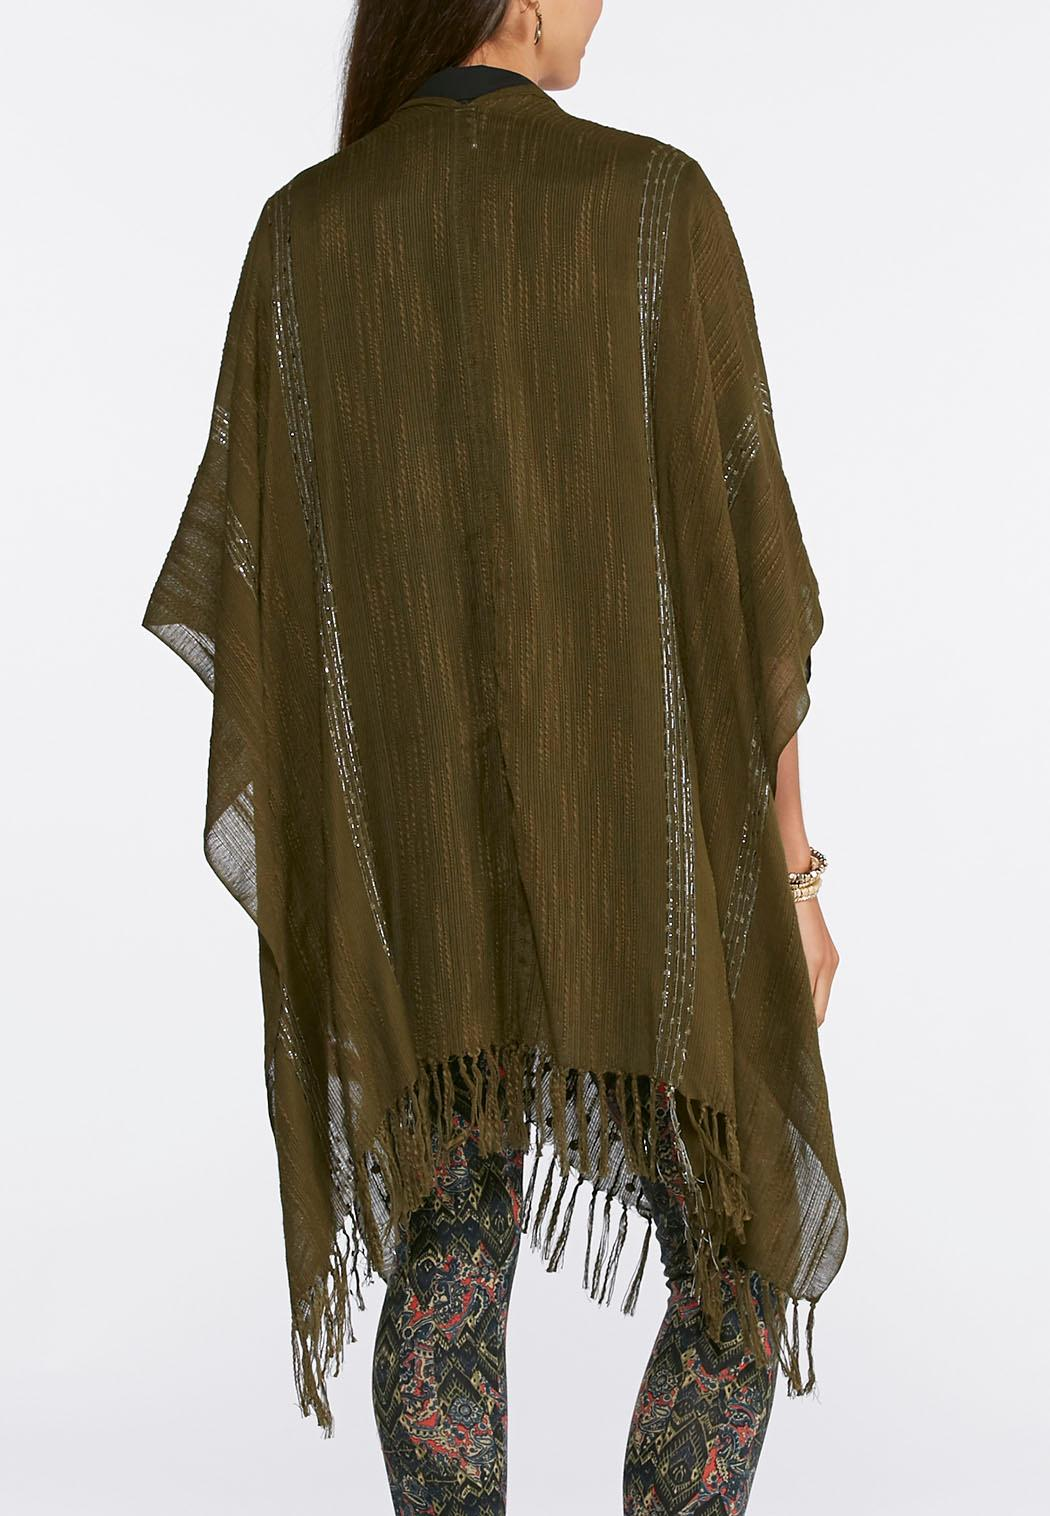 Embellished Slub Poncho Cold Weather Cato Fashions